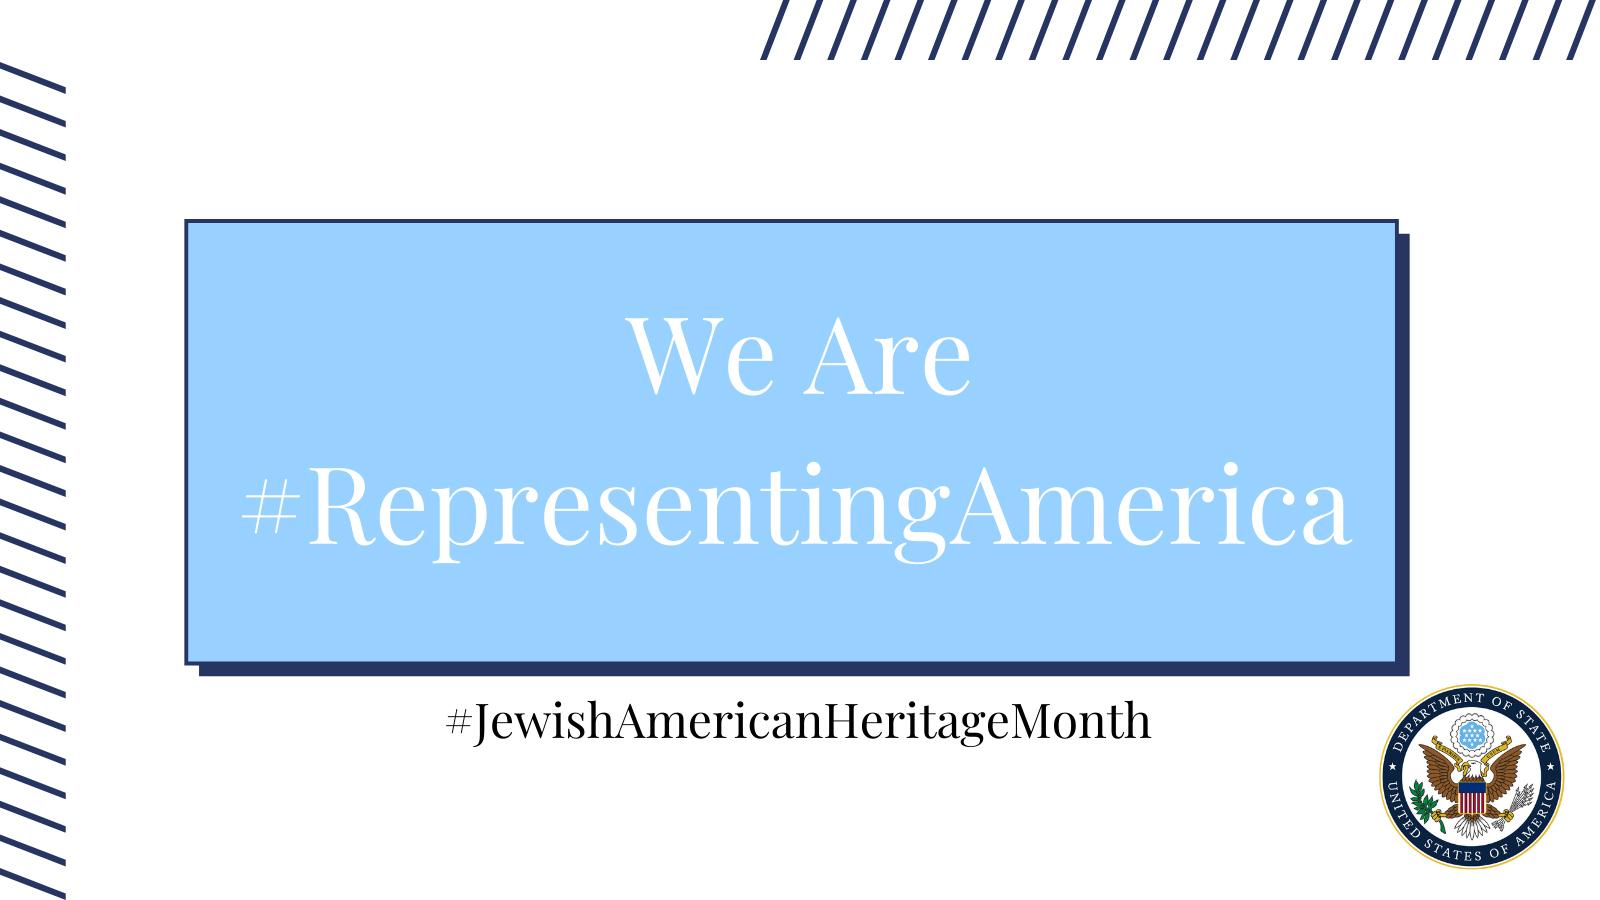 Graphic: Jewish American Heritage Month